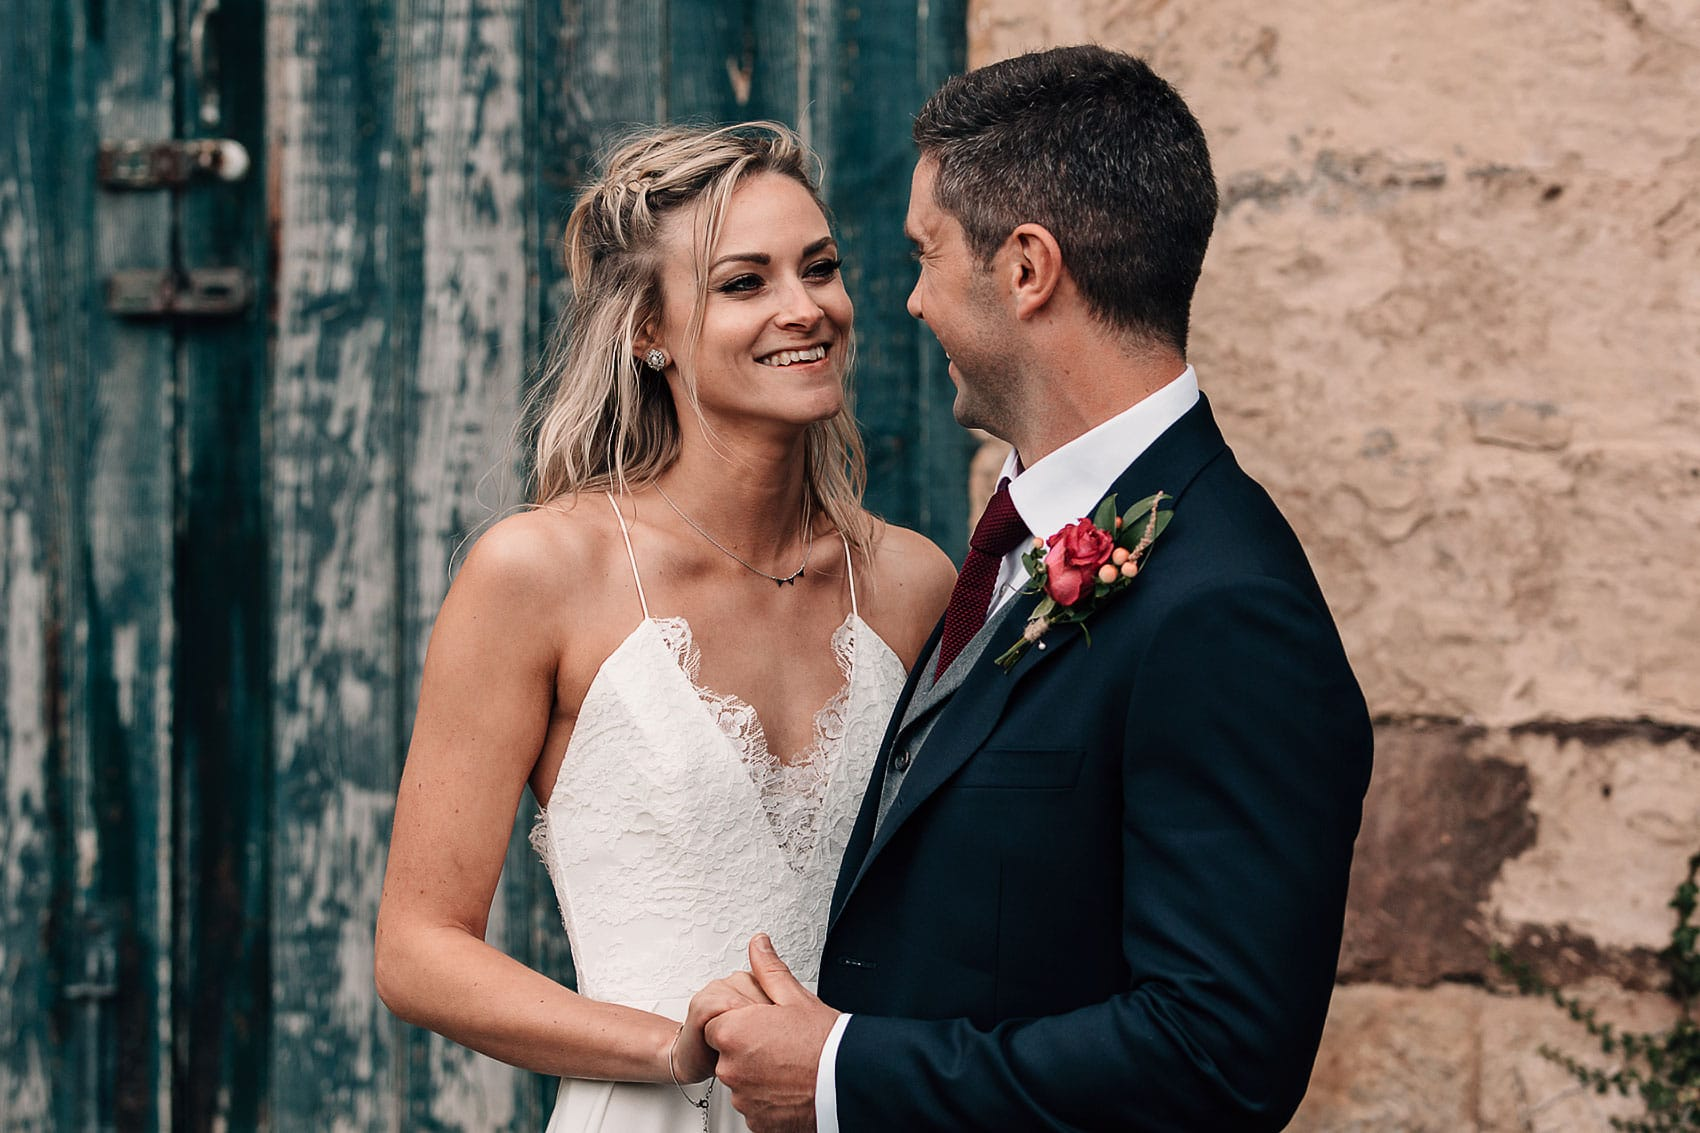 bohemian bride wedding photography